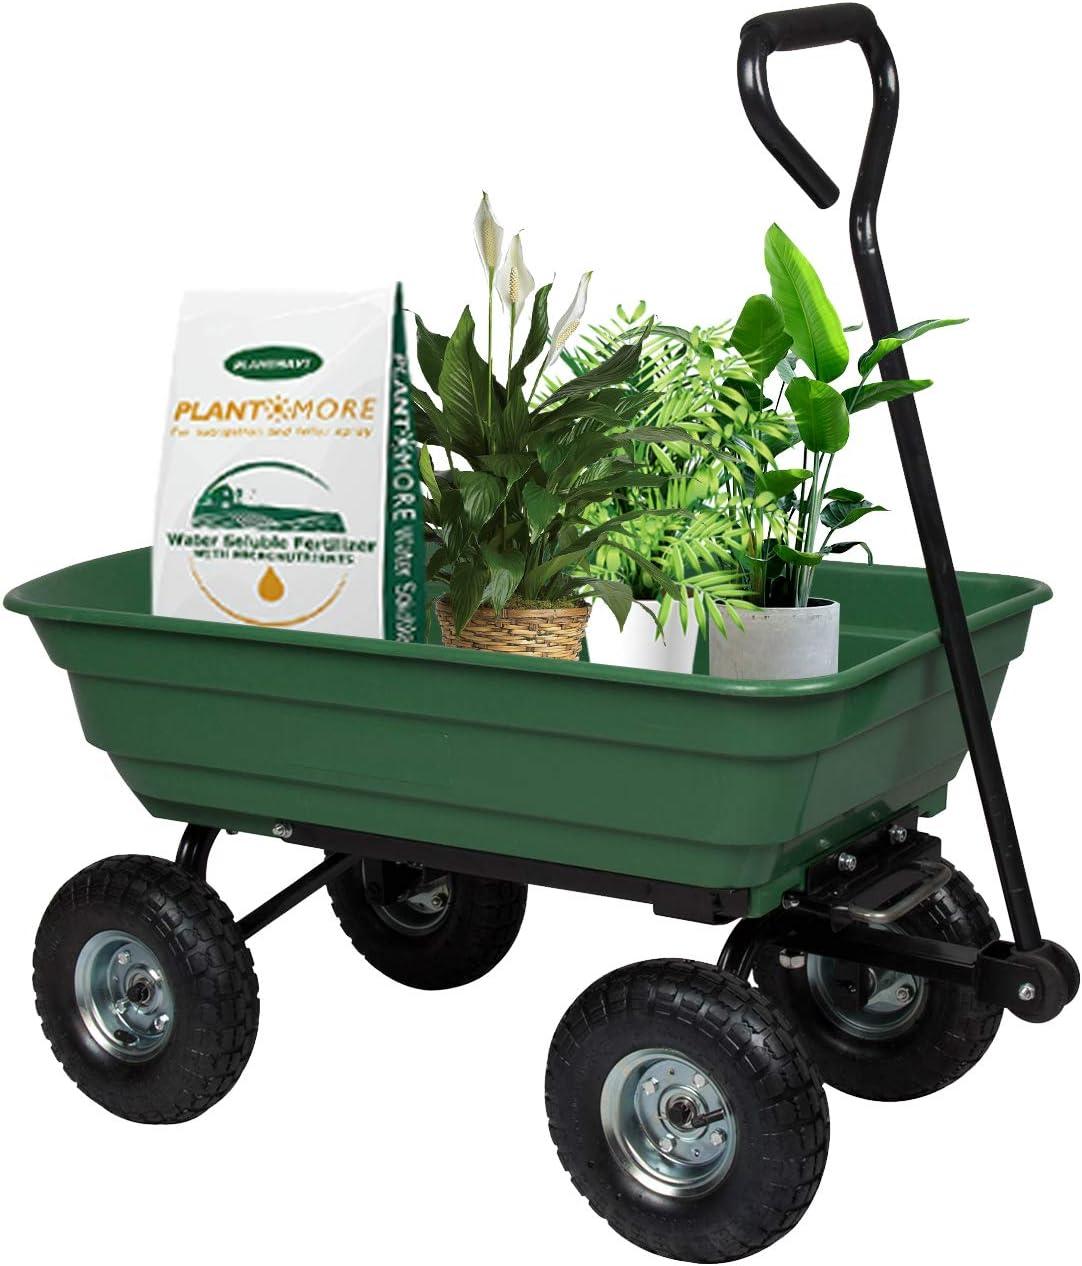 Mail order Garden Dump Cart Wagon Gardening a with Frame Mesa Mall Steel Trolley